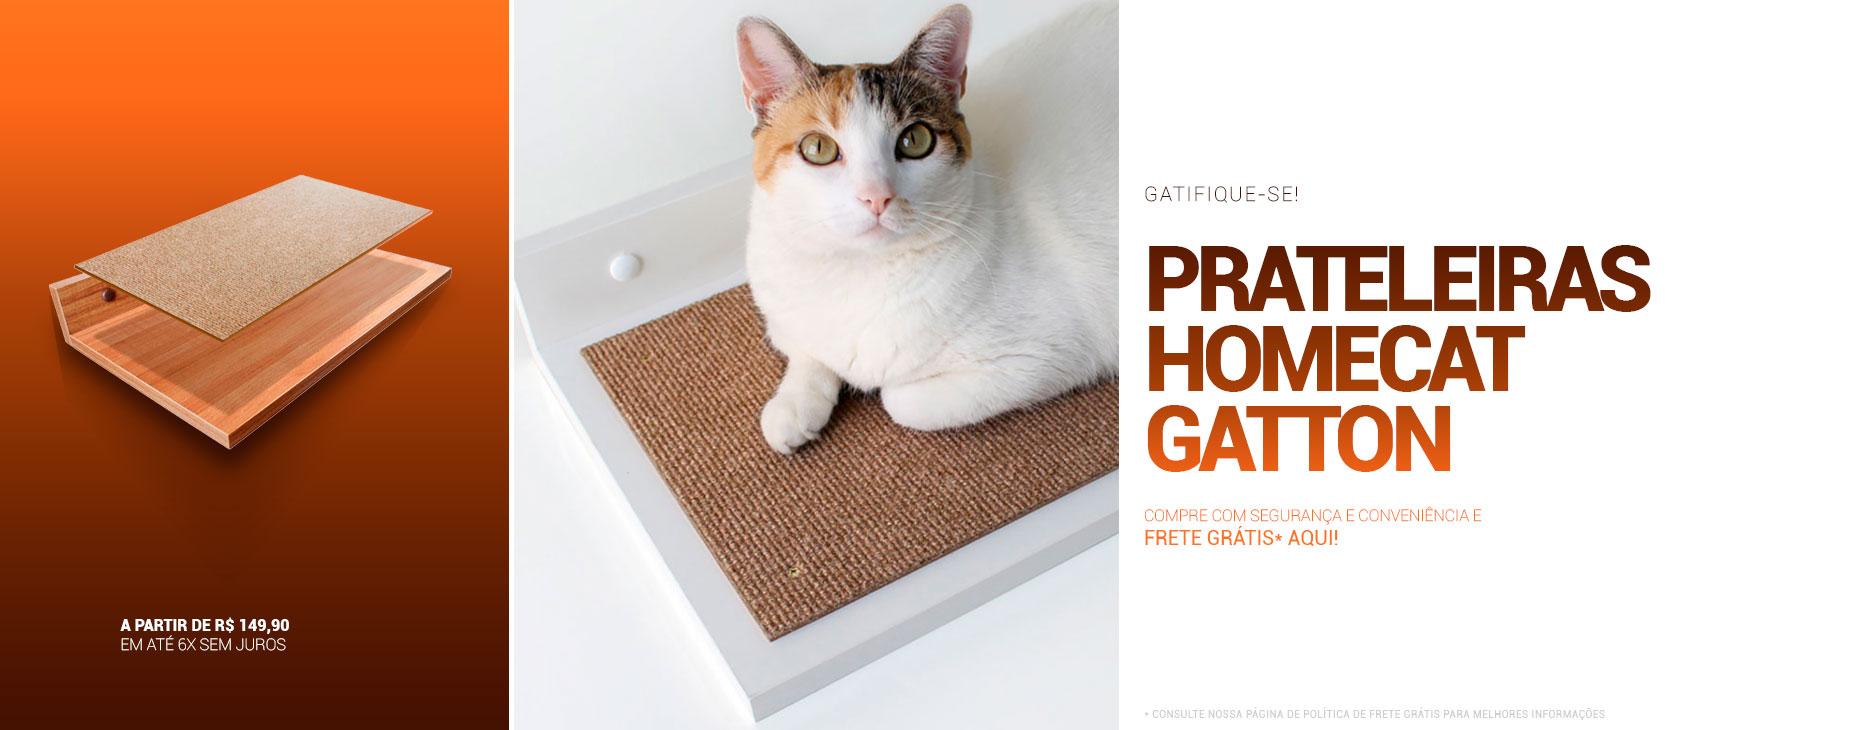 Prateleira Homecat Gatton